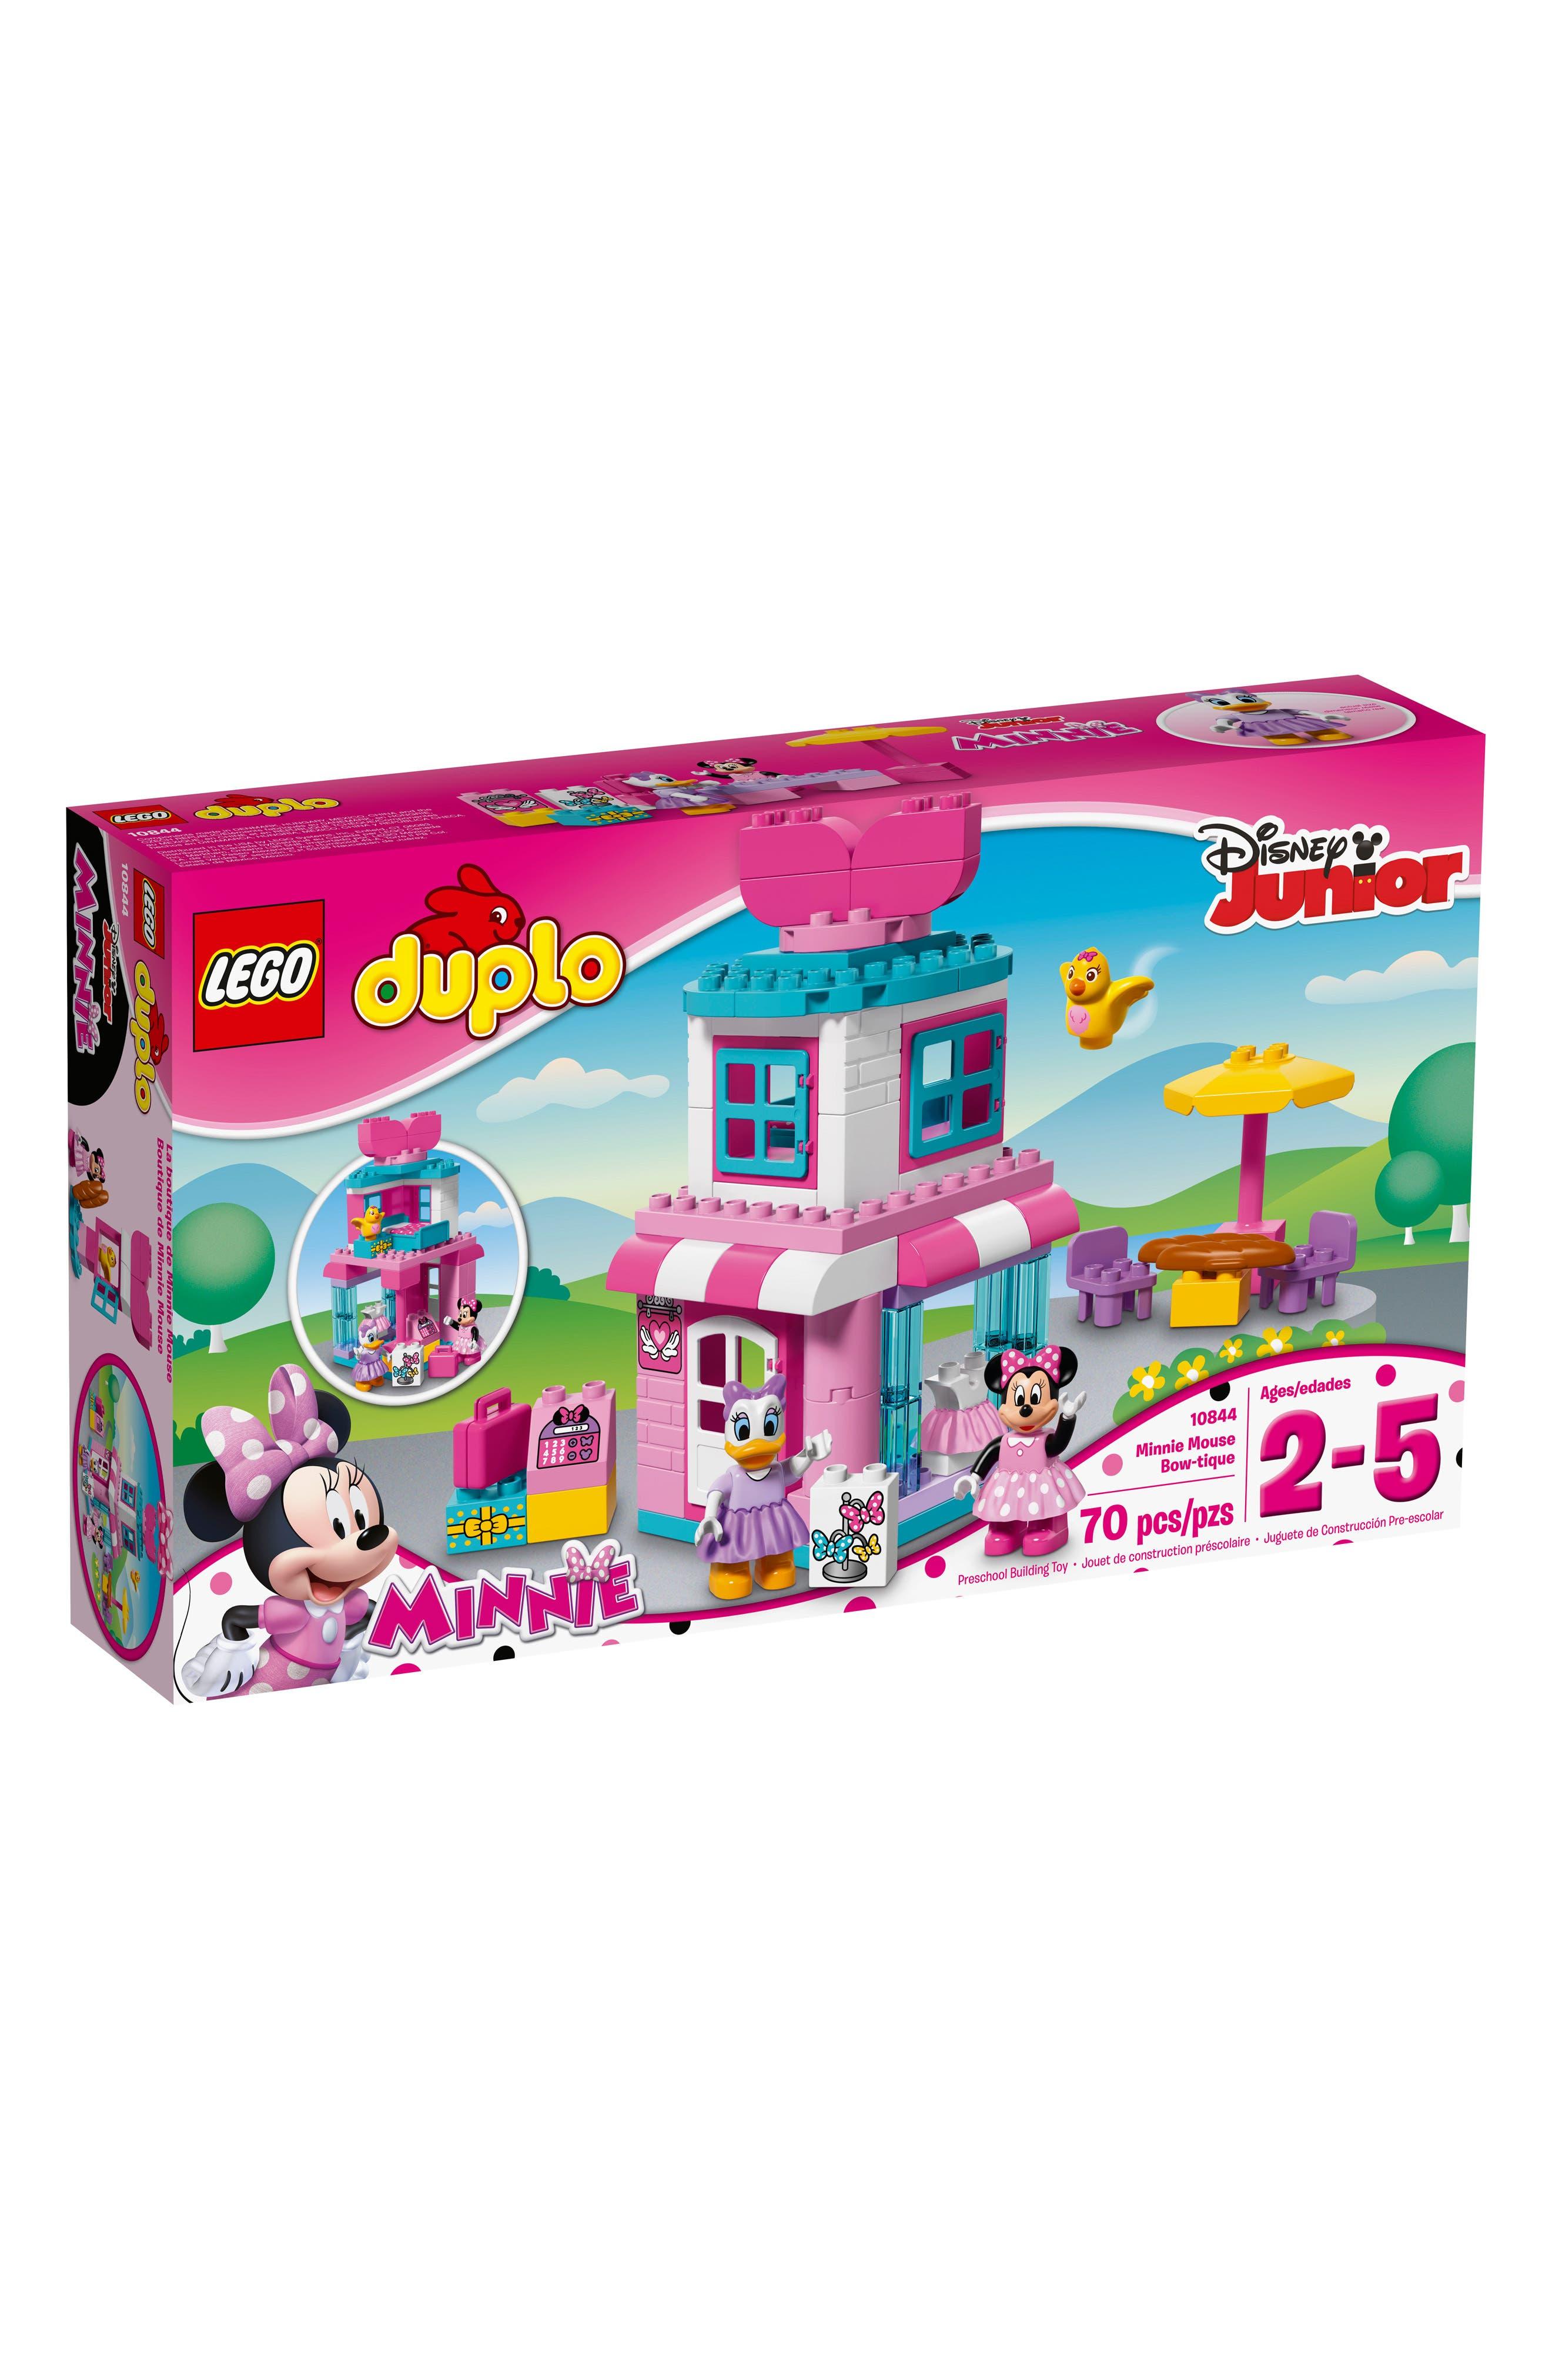 LEGO® DUPLO® Disney™ Minnie Mouse Bow-Tique Play Set - 10844